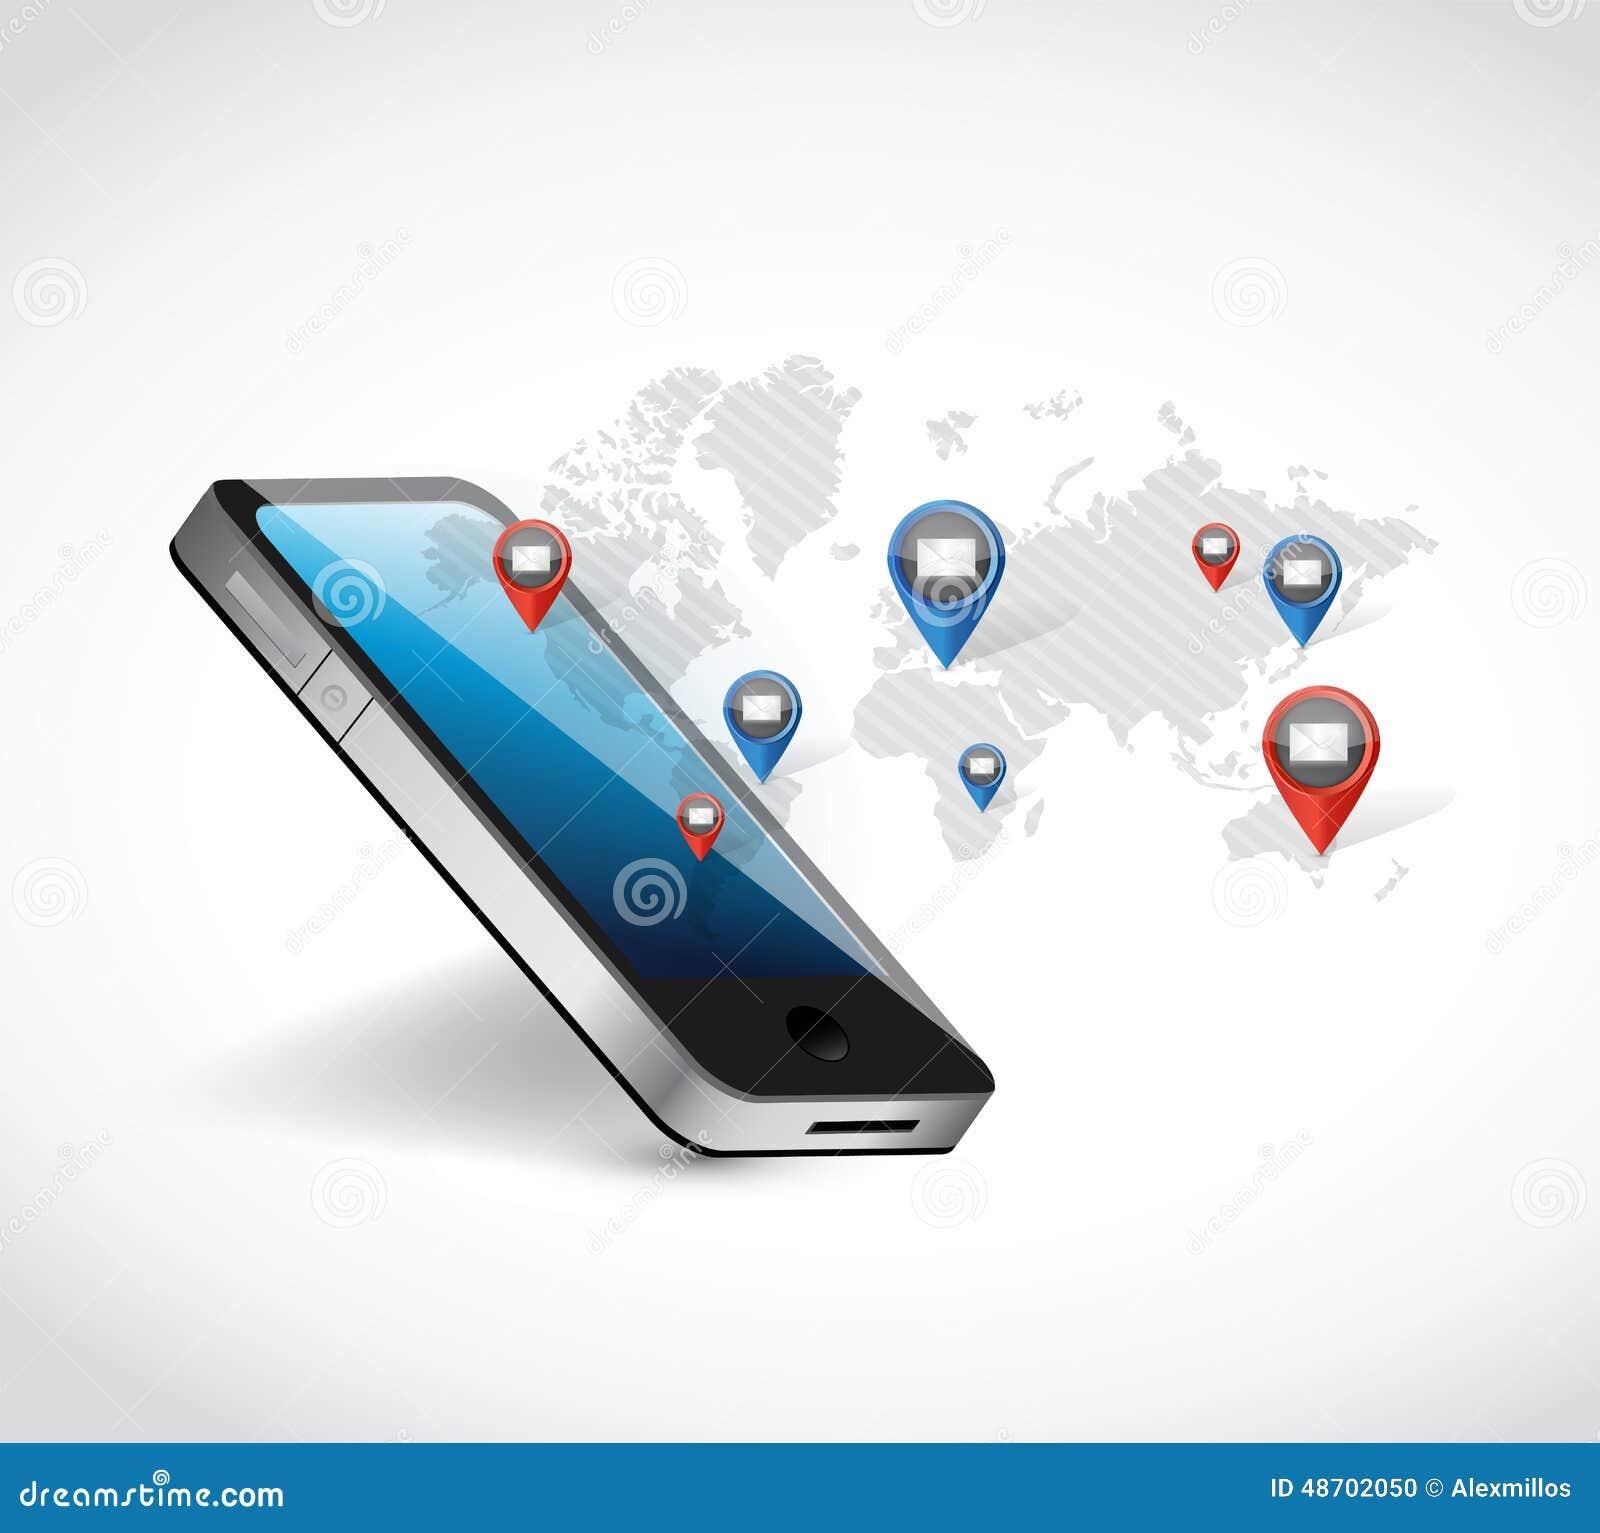 Phone world map network communication illustration stock photo phone world map network communication illustration royalty free stock photo publicscrutiny Choice Image